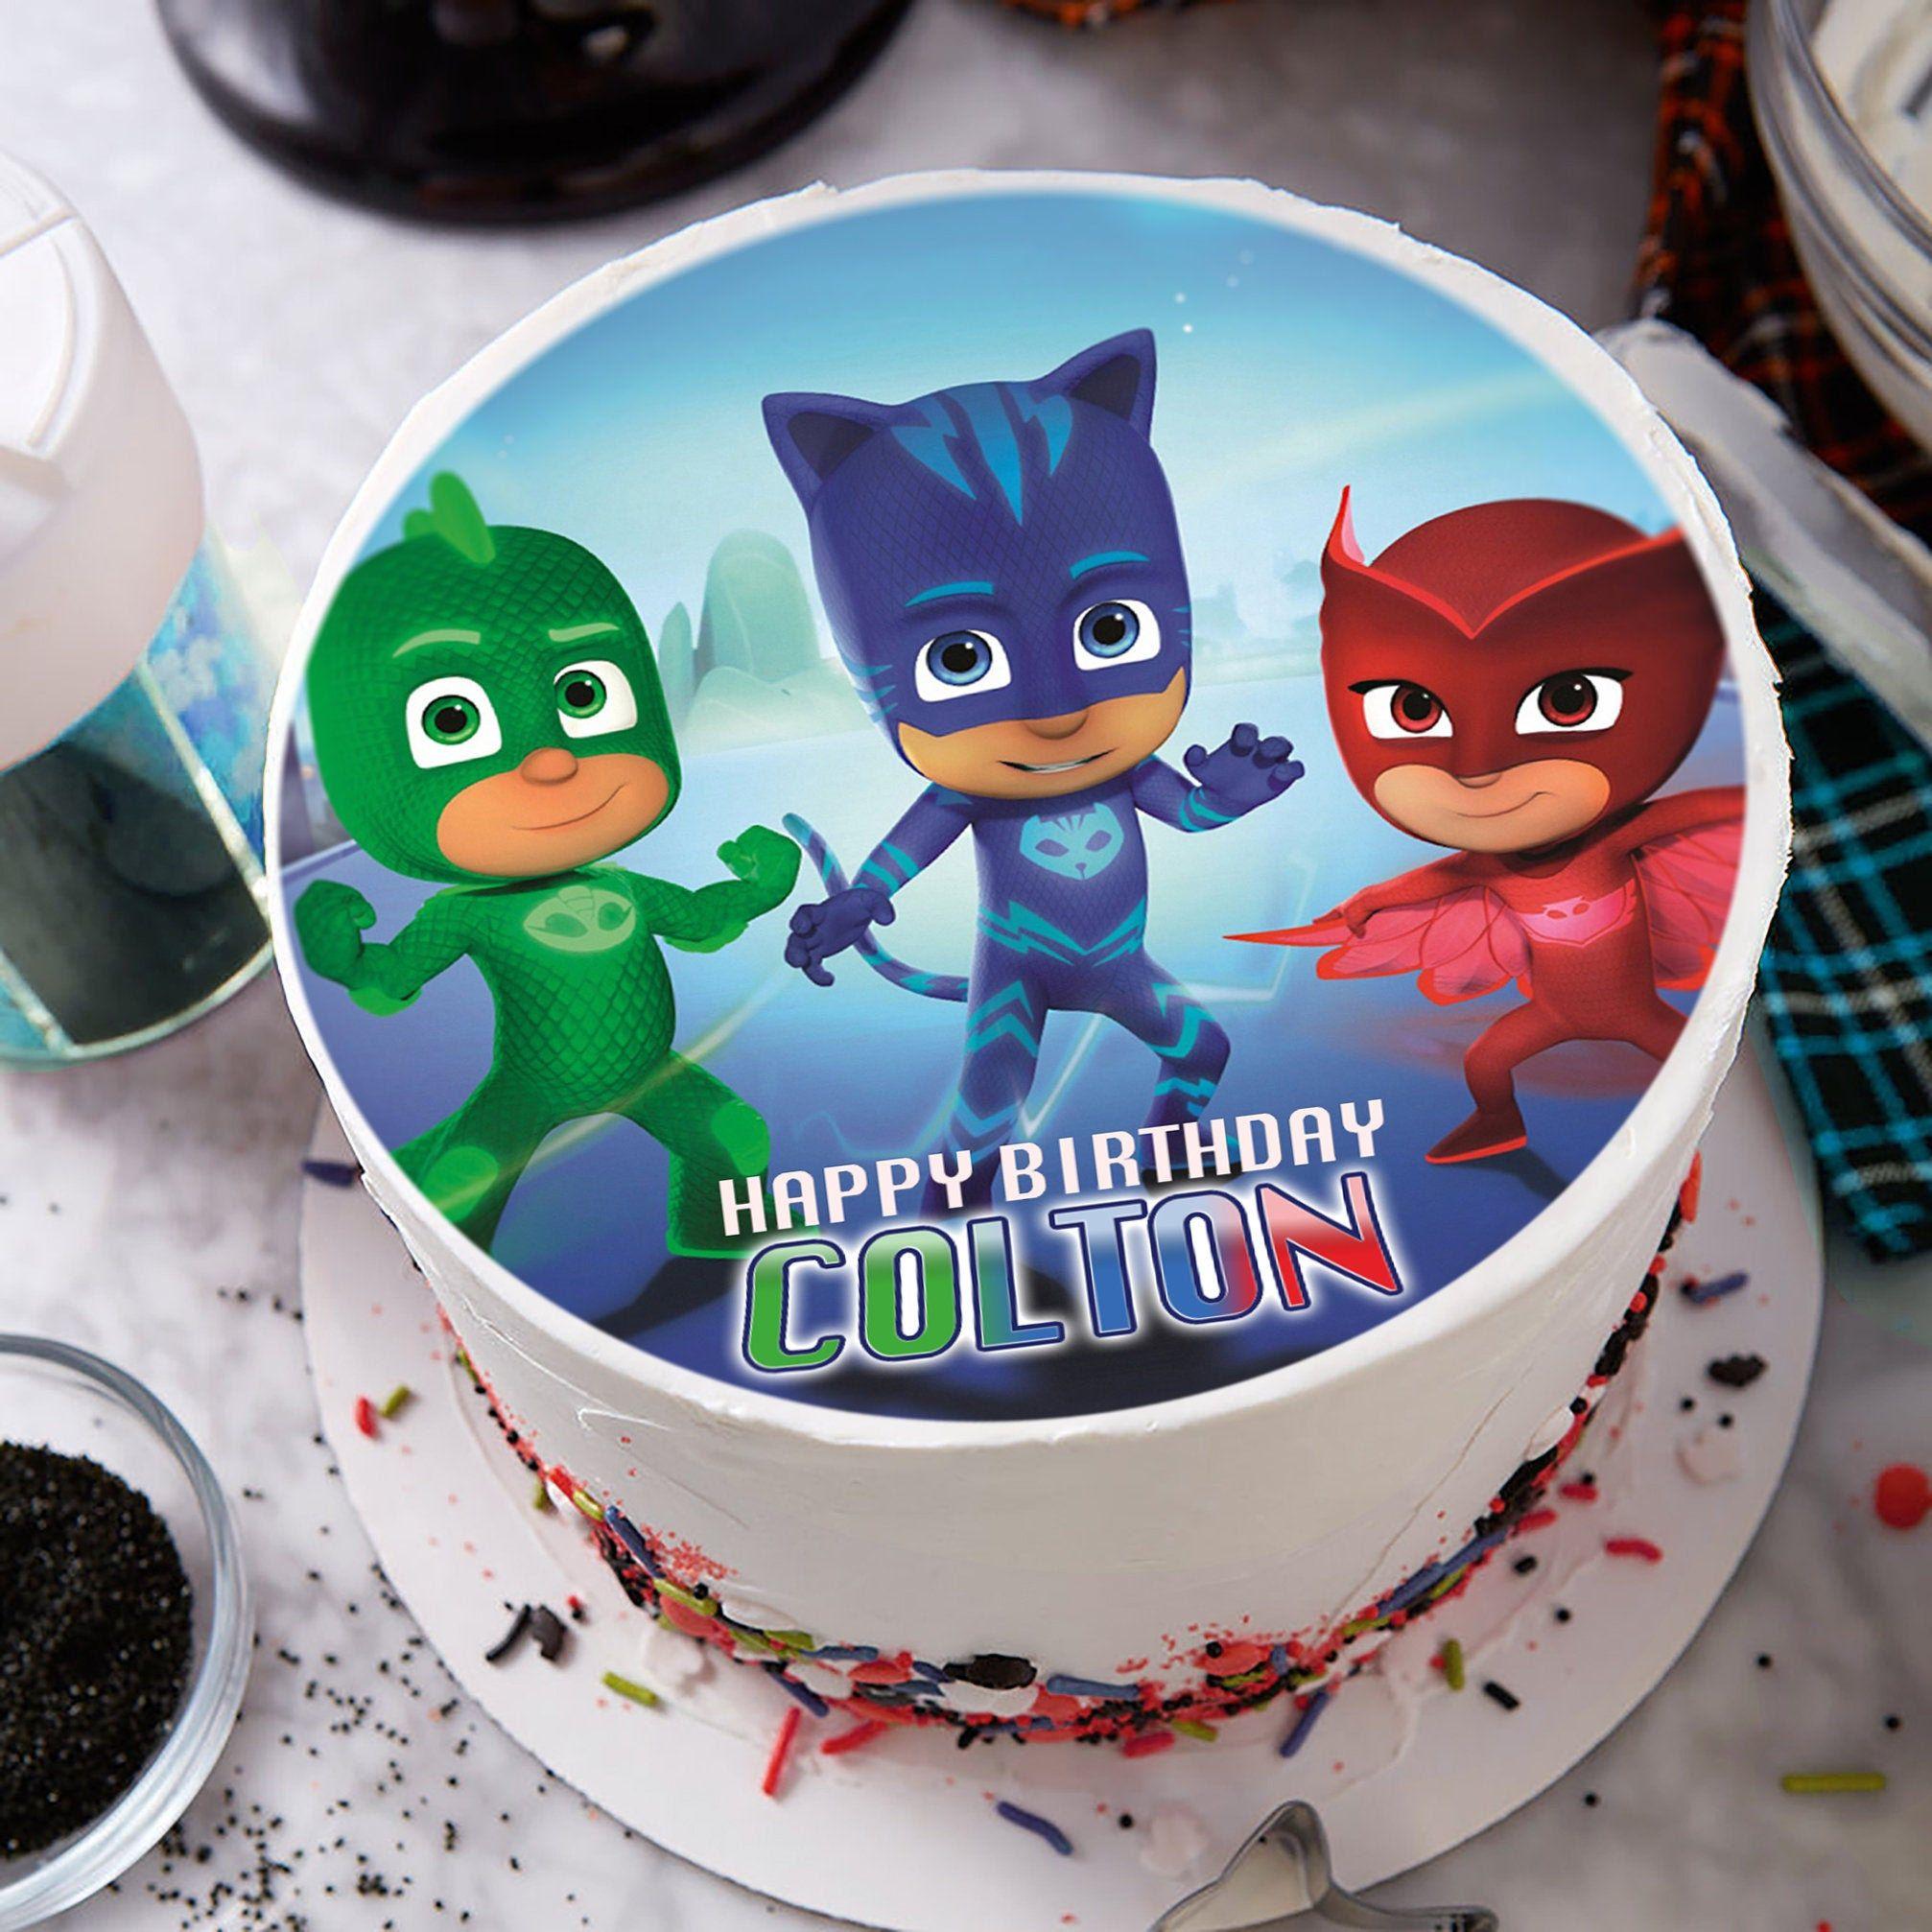 Pj mask image edible cake topper party decoration